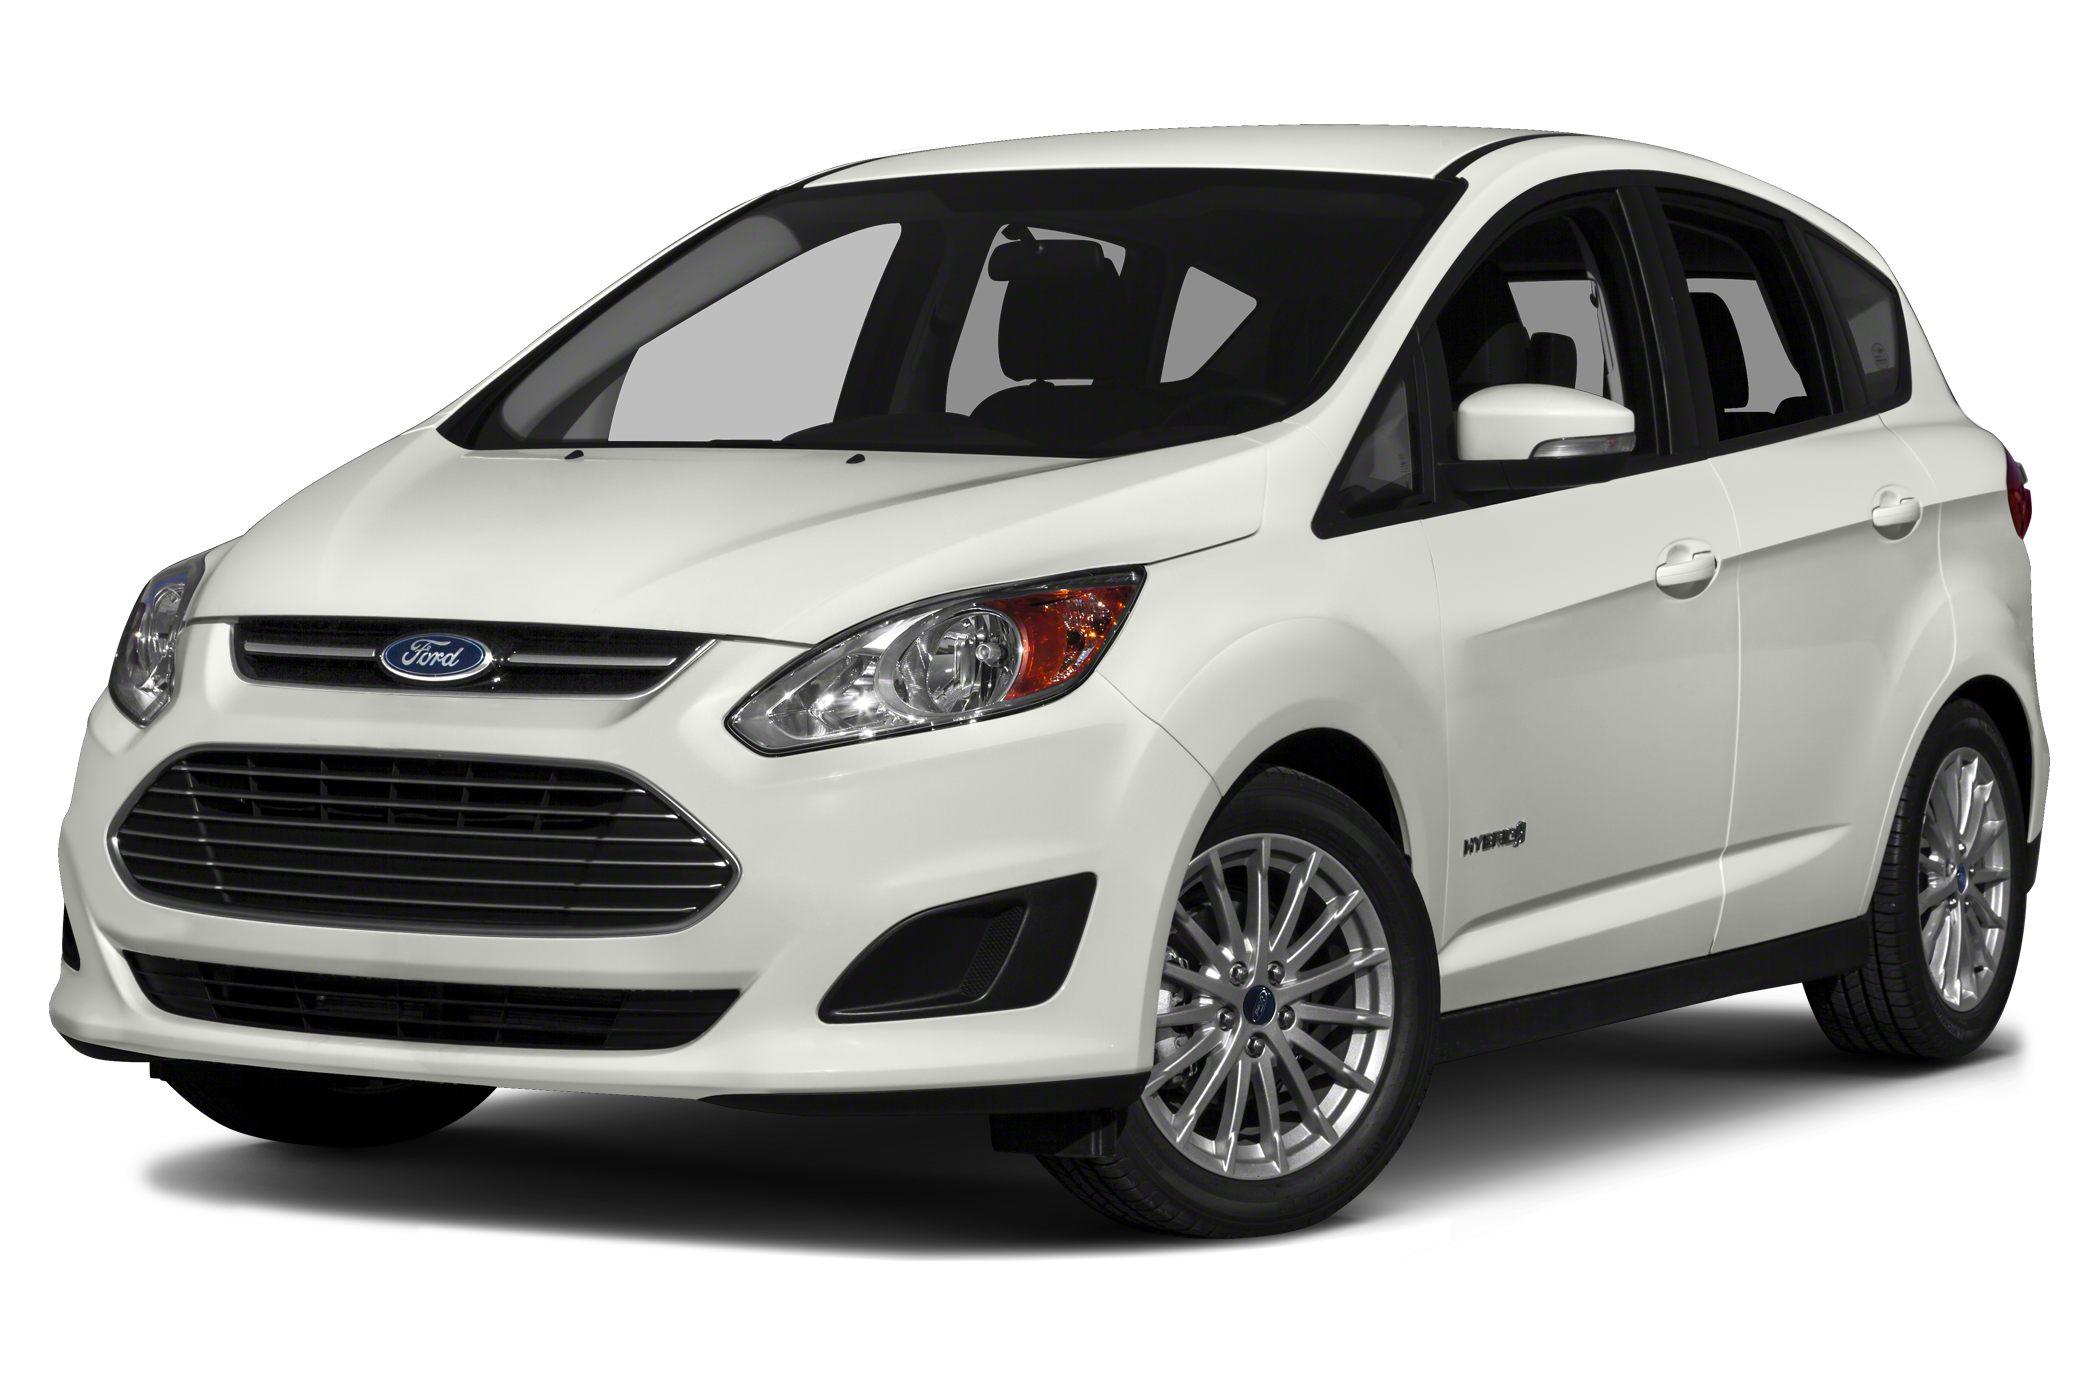 2016 Ford C-Max Hybrid SE HYBRID BLUETOOTH MP3 Player KEYLESS ENTRY 36 MPG Highway ALLOY WHEE